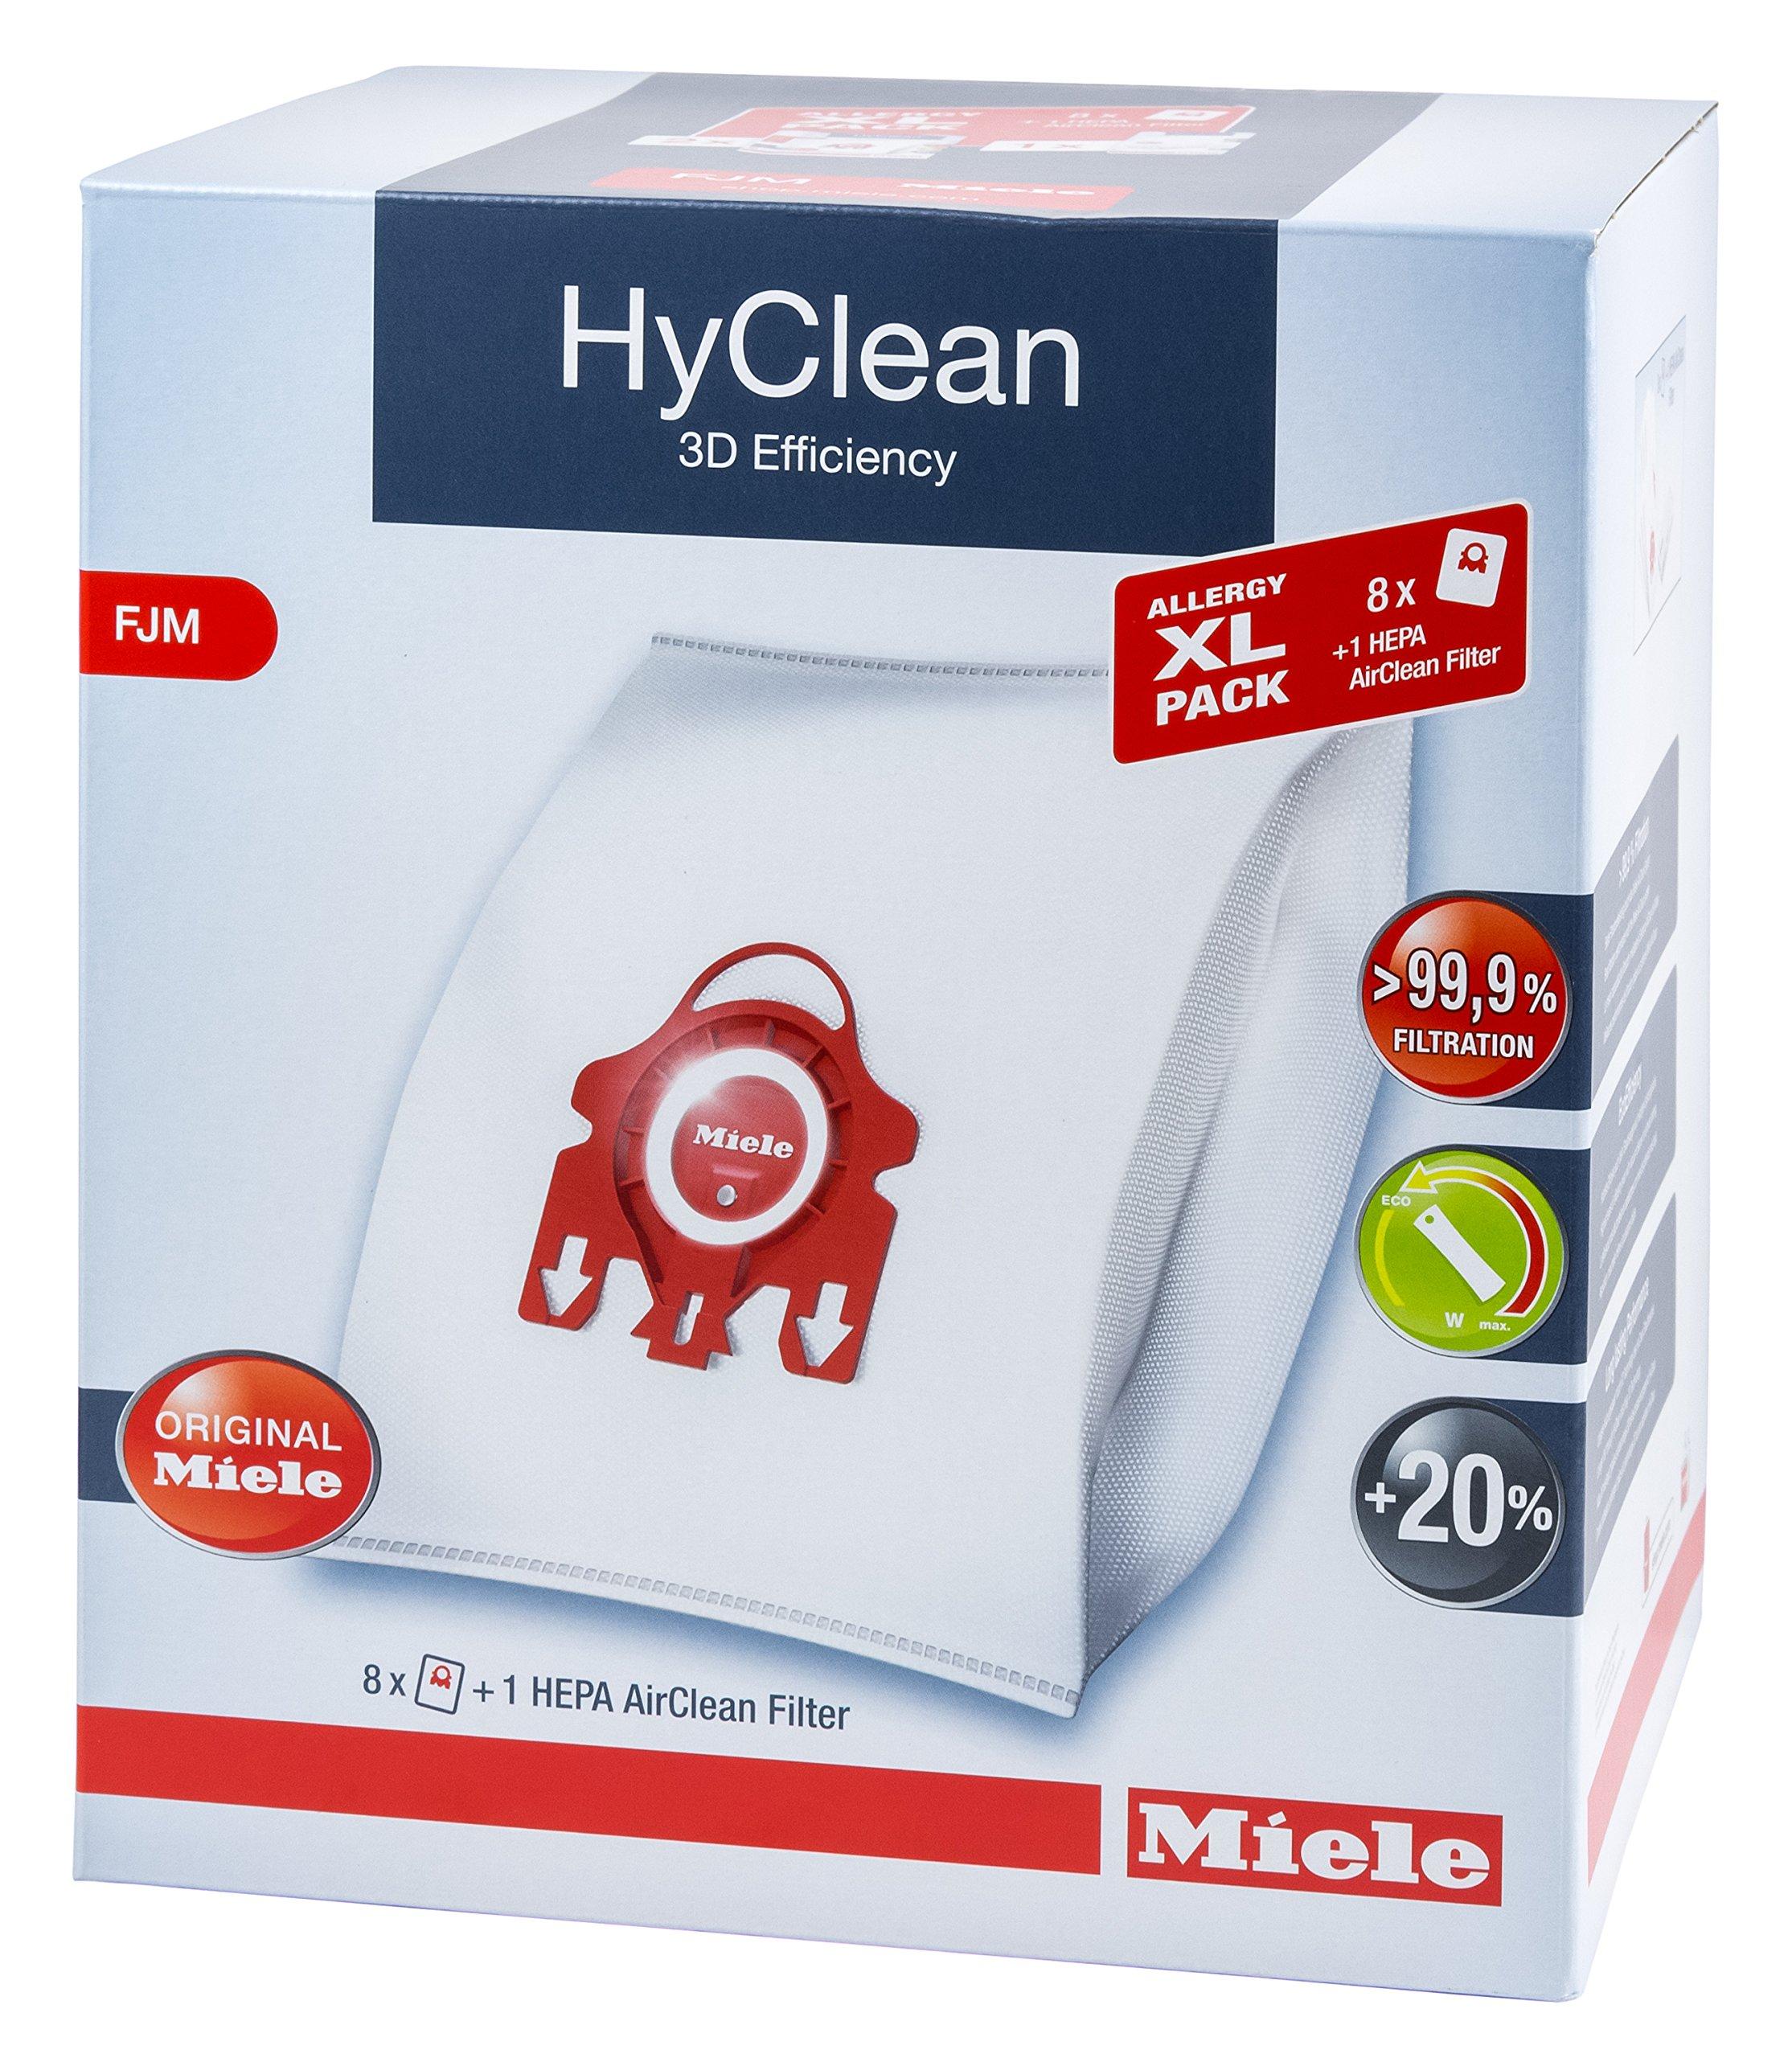 Miele XL Pack - 8X Hyclean 3D FJM Vacuum Bags +1 Hepa Filter SF-HA 50